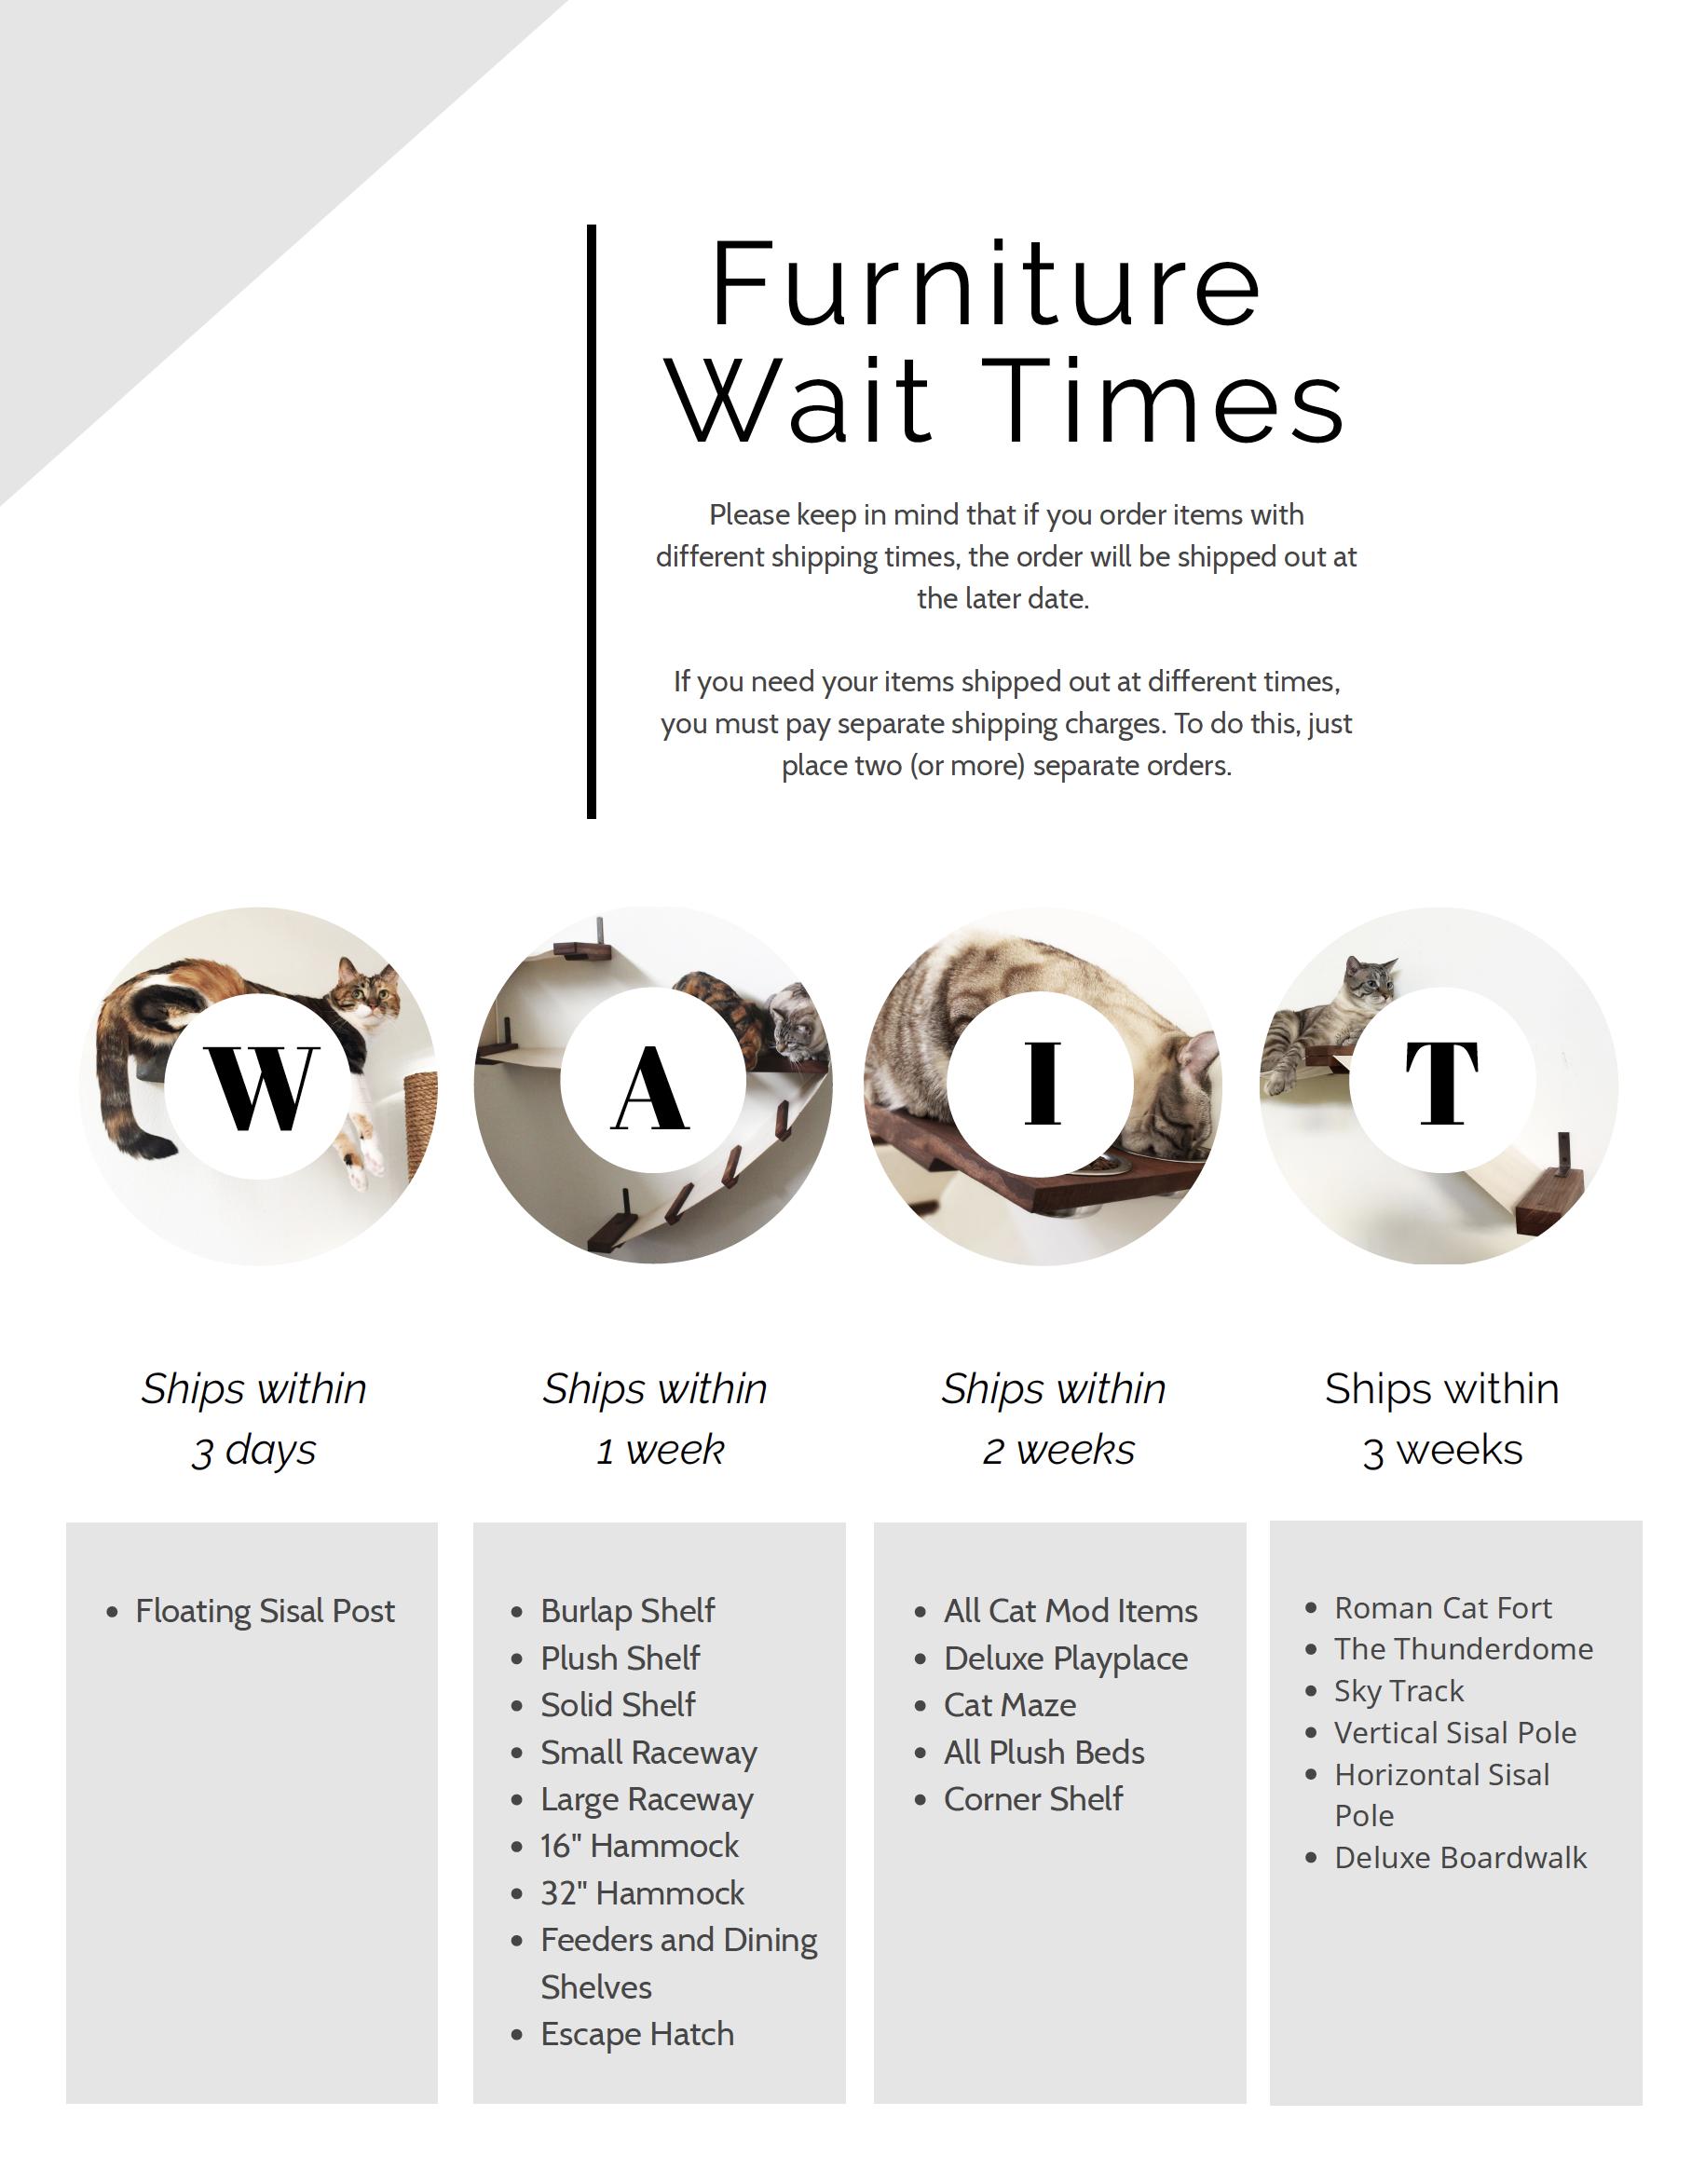 Cat Furniture Wait Times